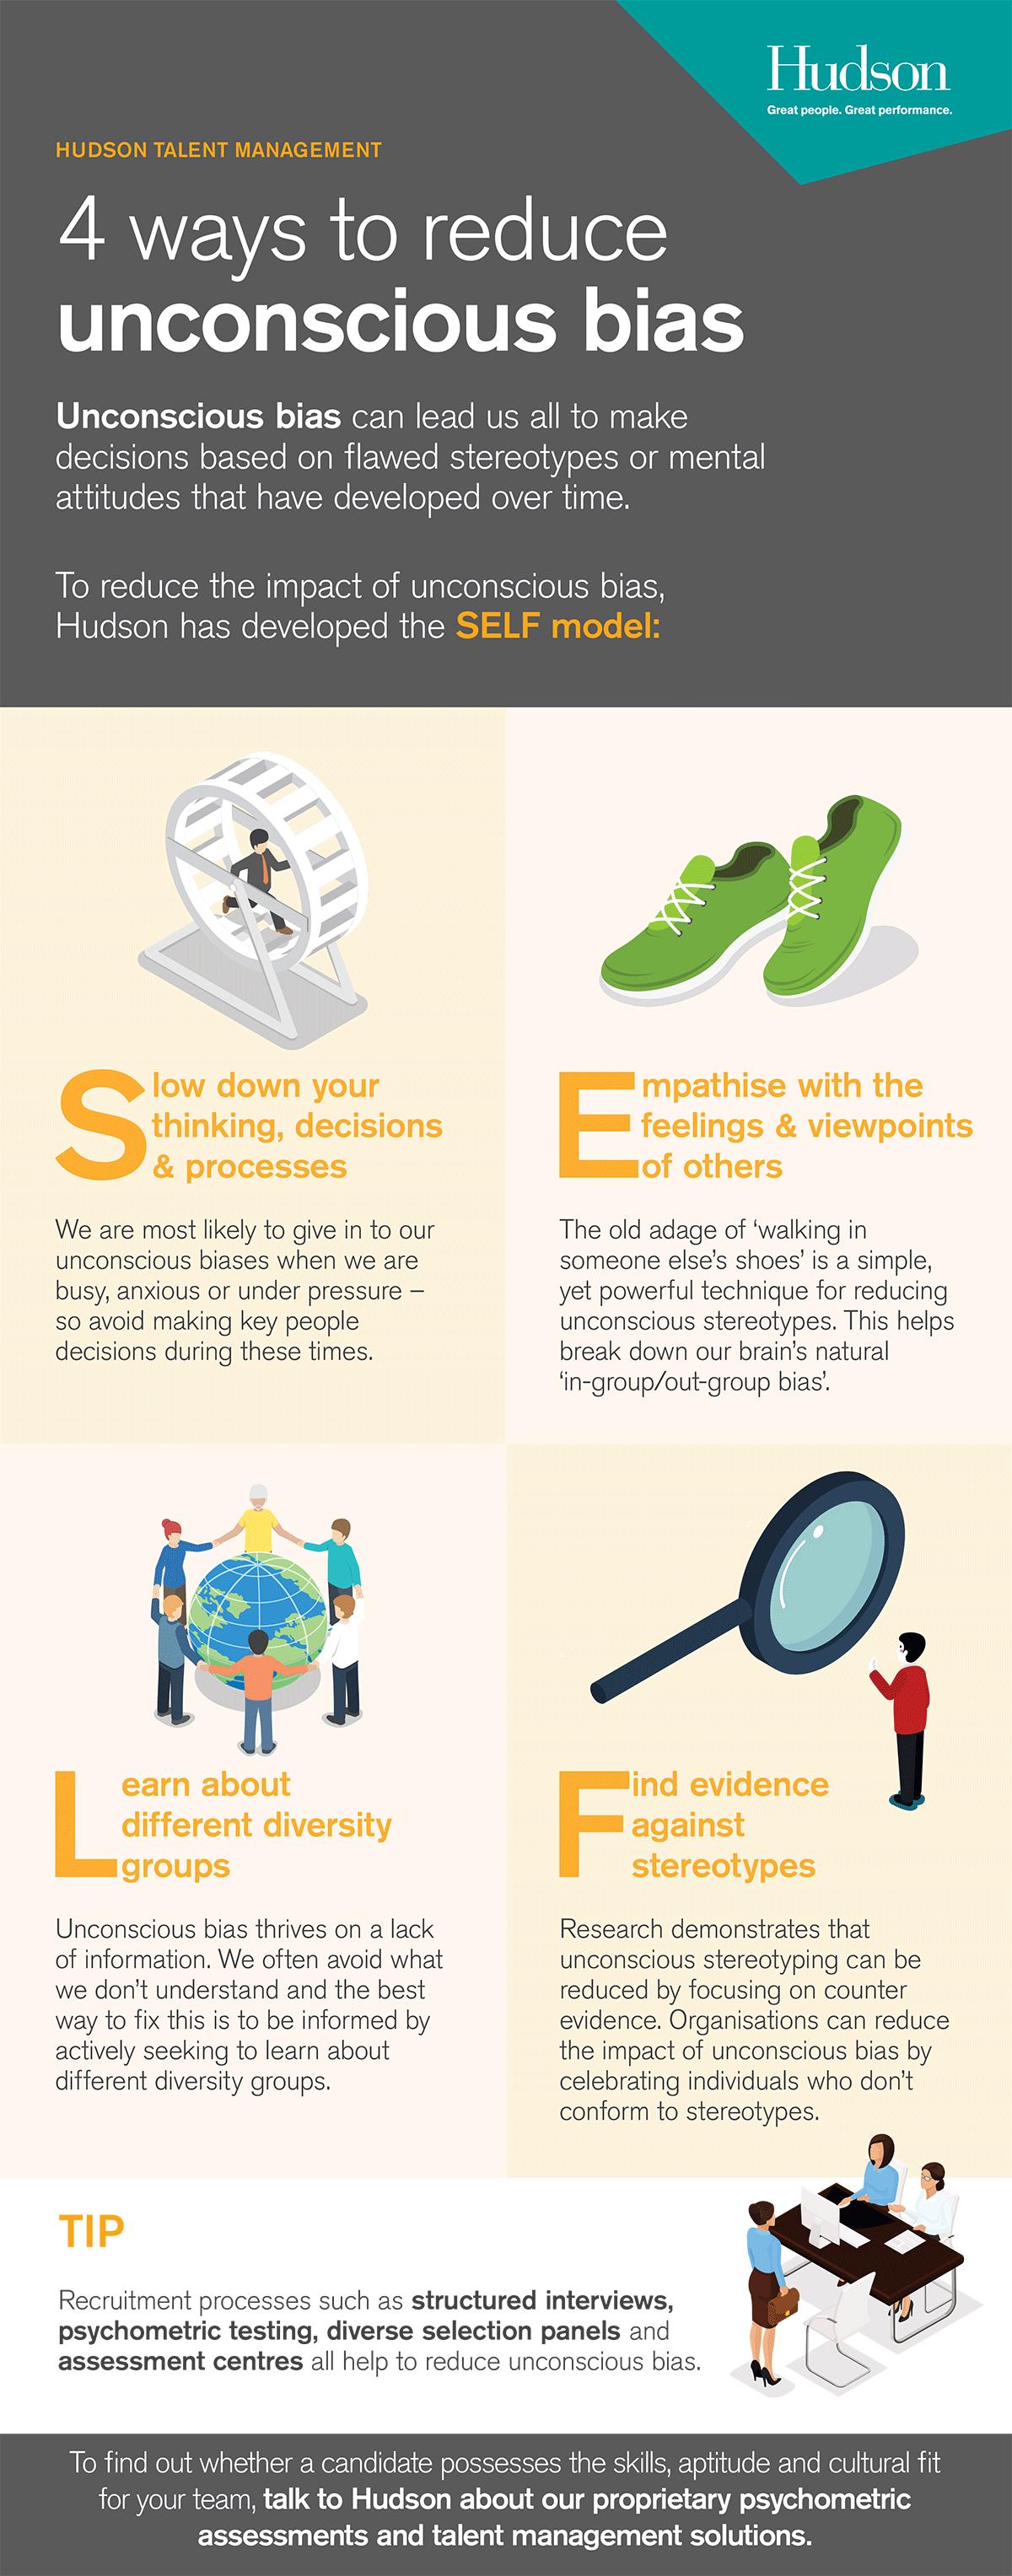 4 ways to reduce unconscious bias infographic